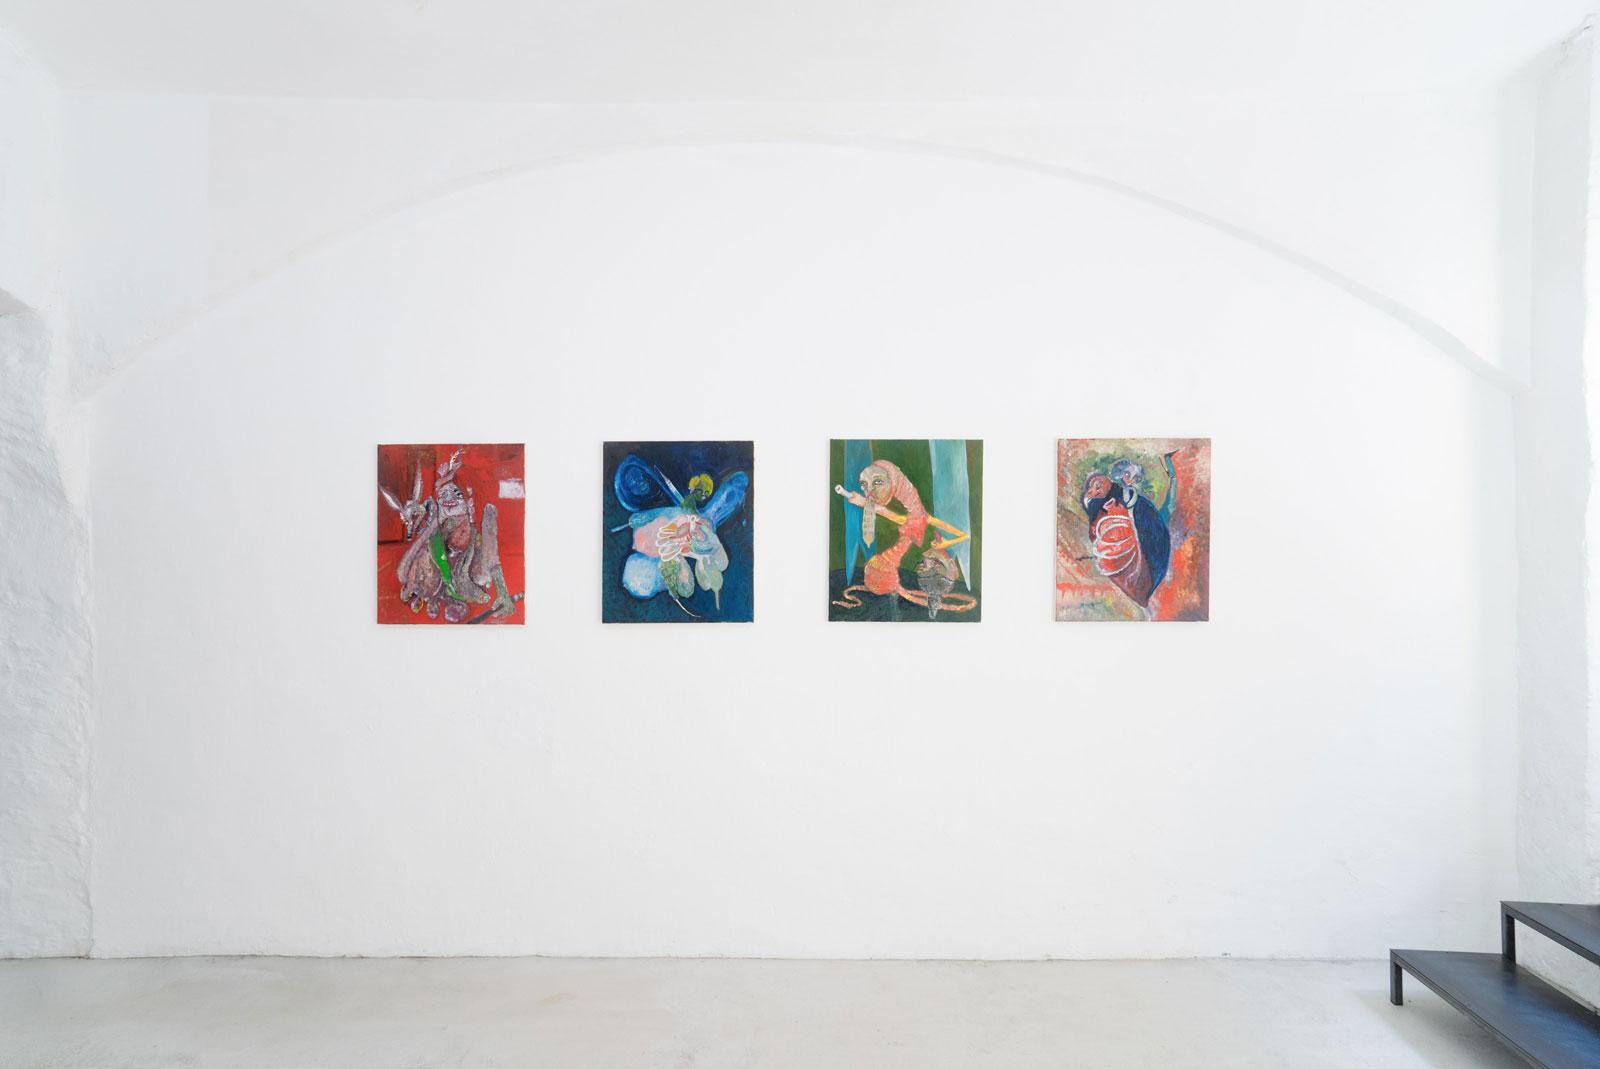 Joseph Geagan, Cha-Cha Kaputt, exhibition view